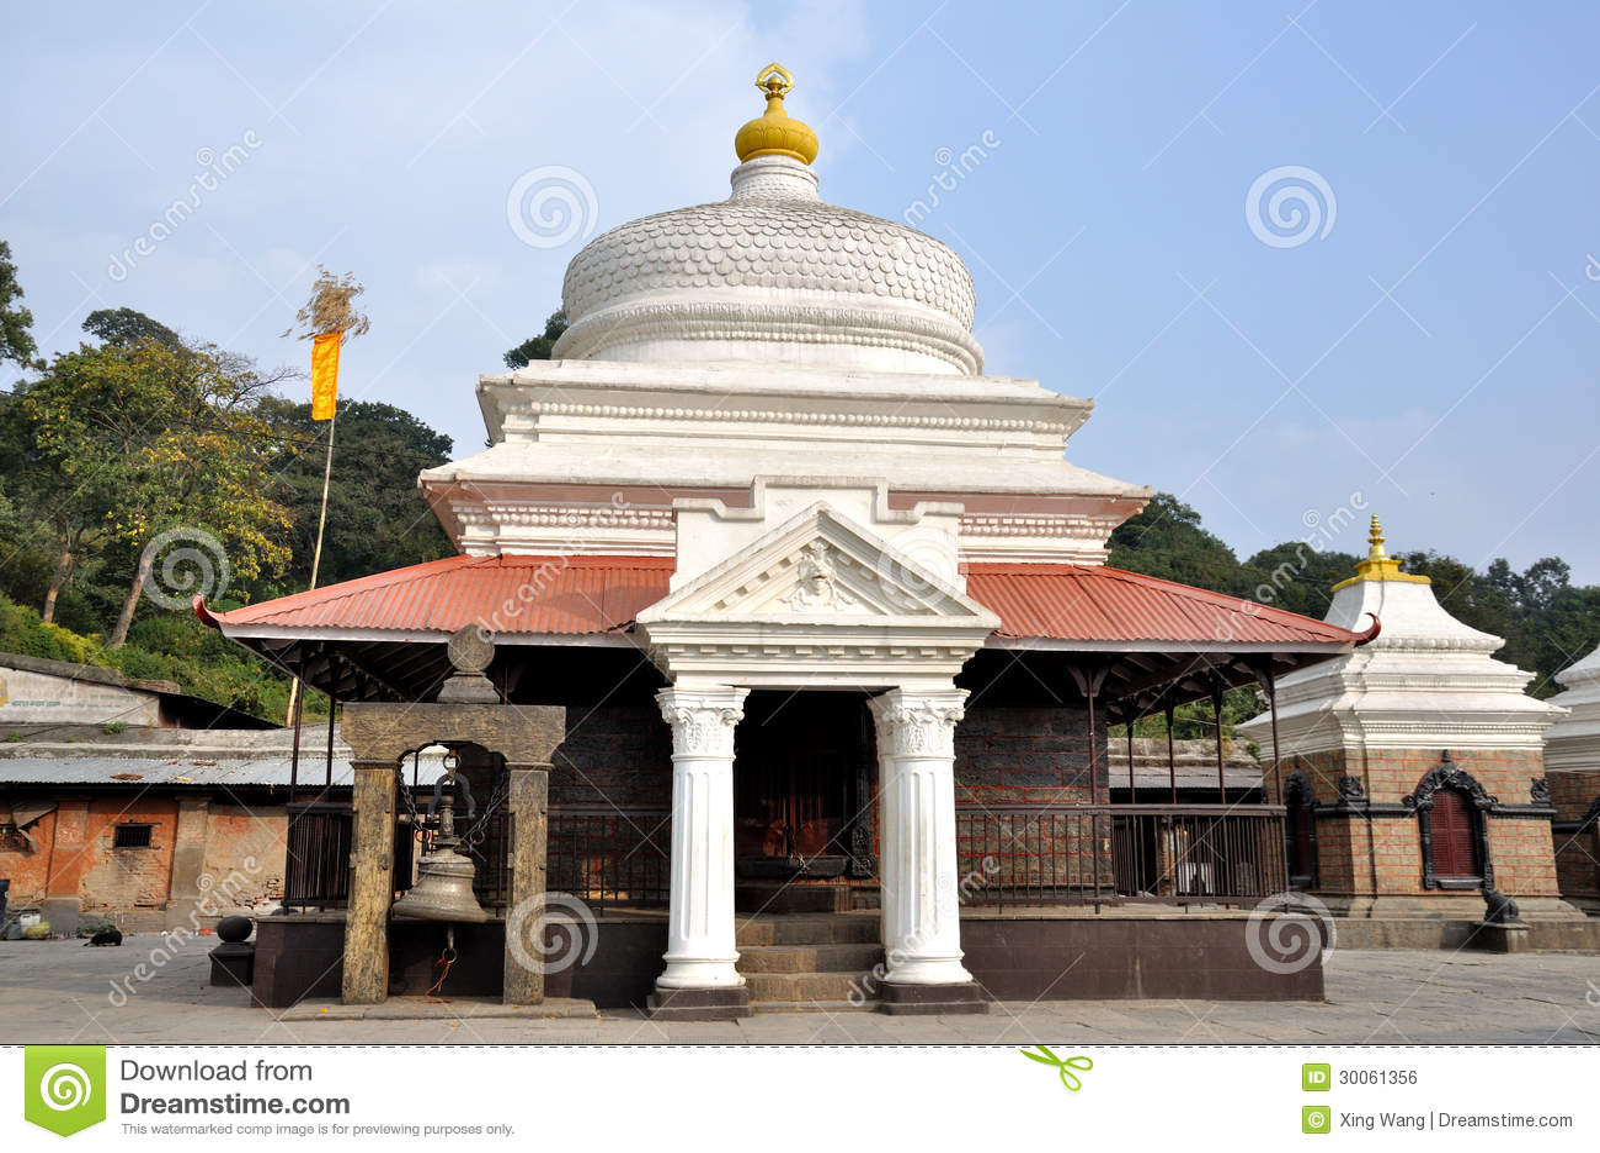 pashupatinath temple free -#main